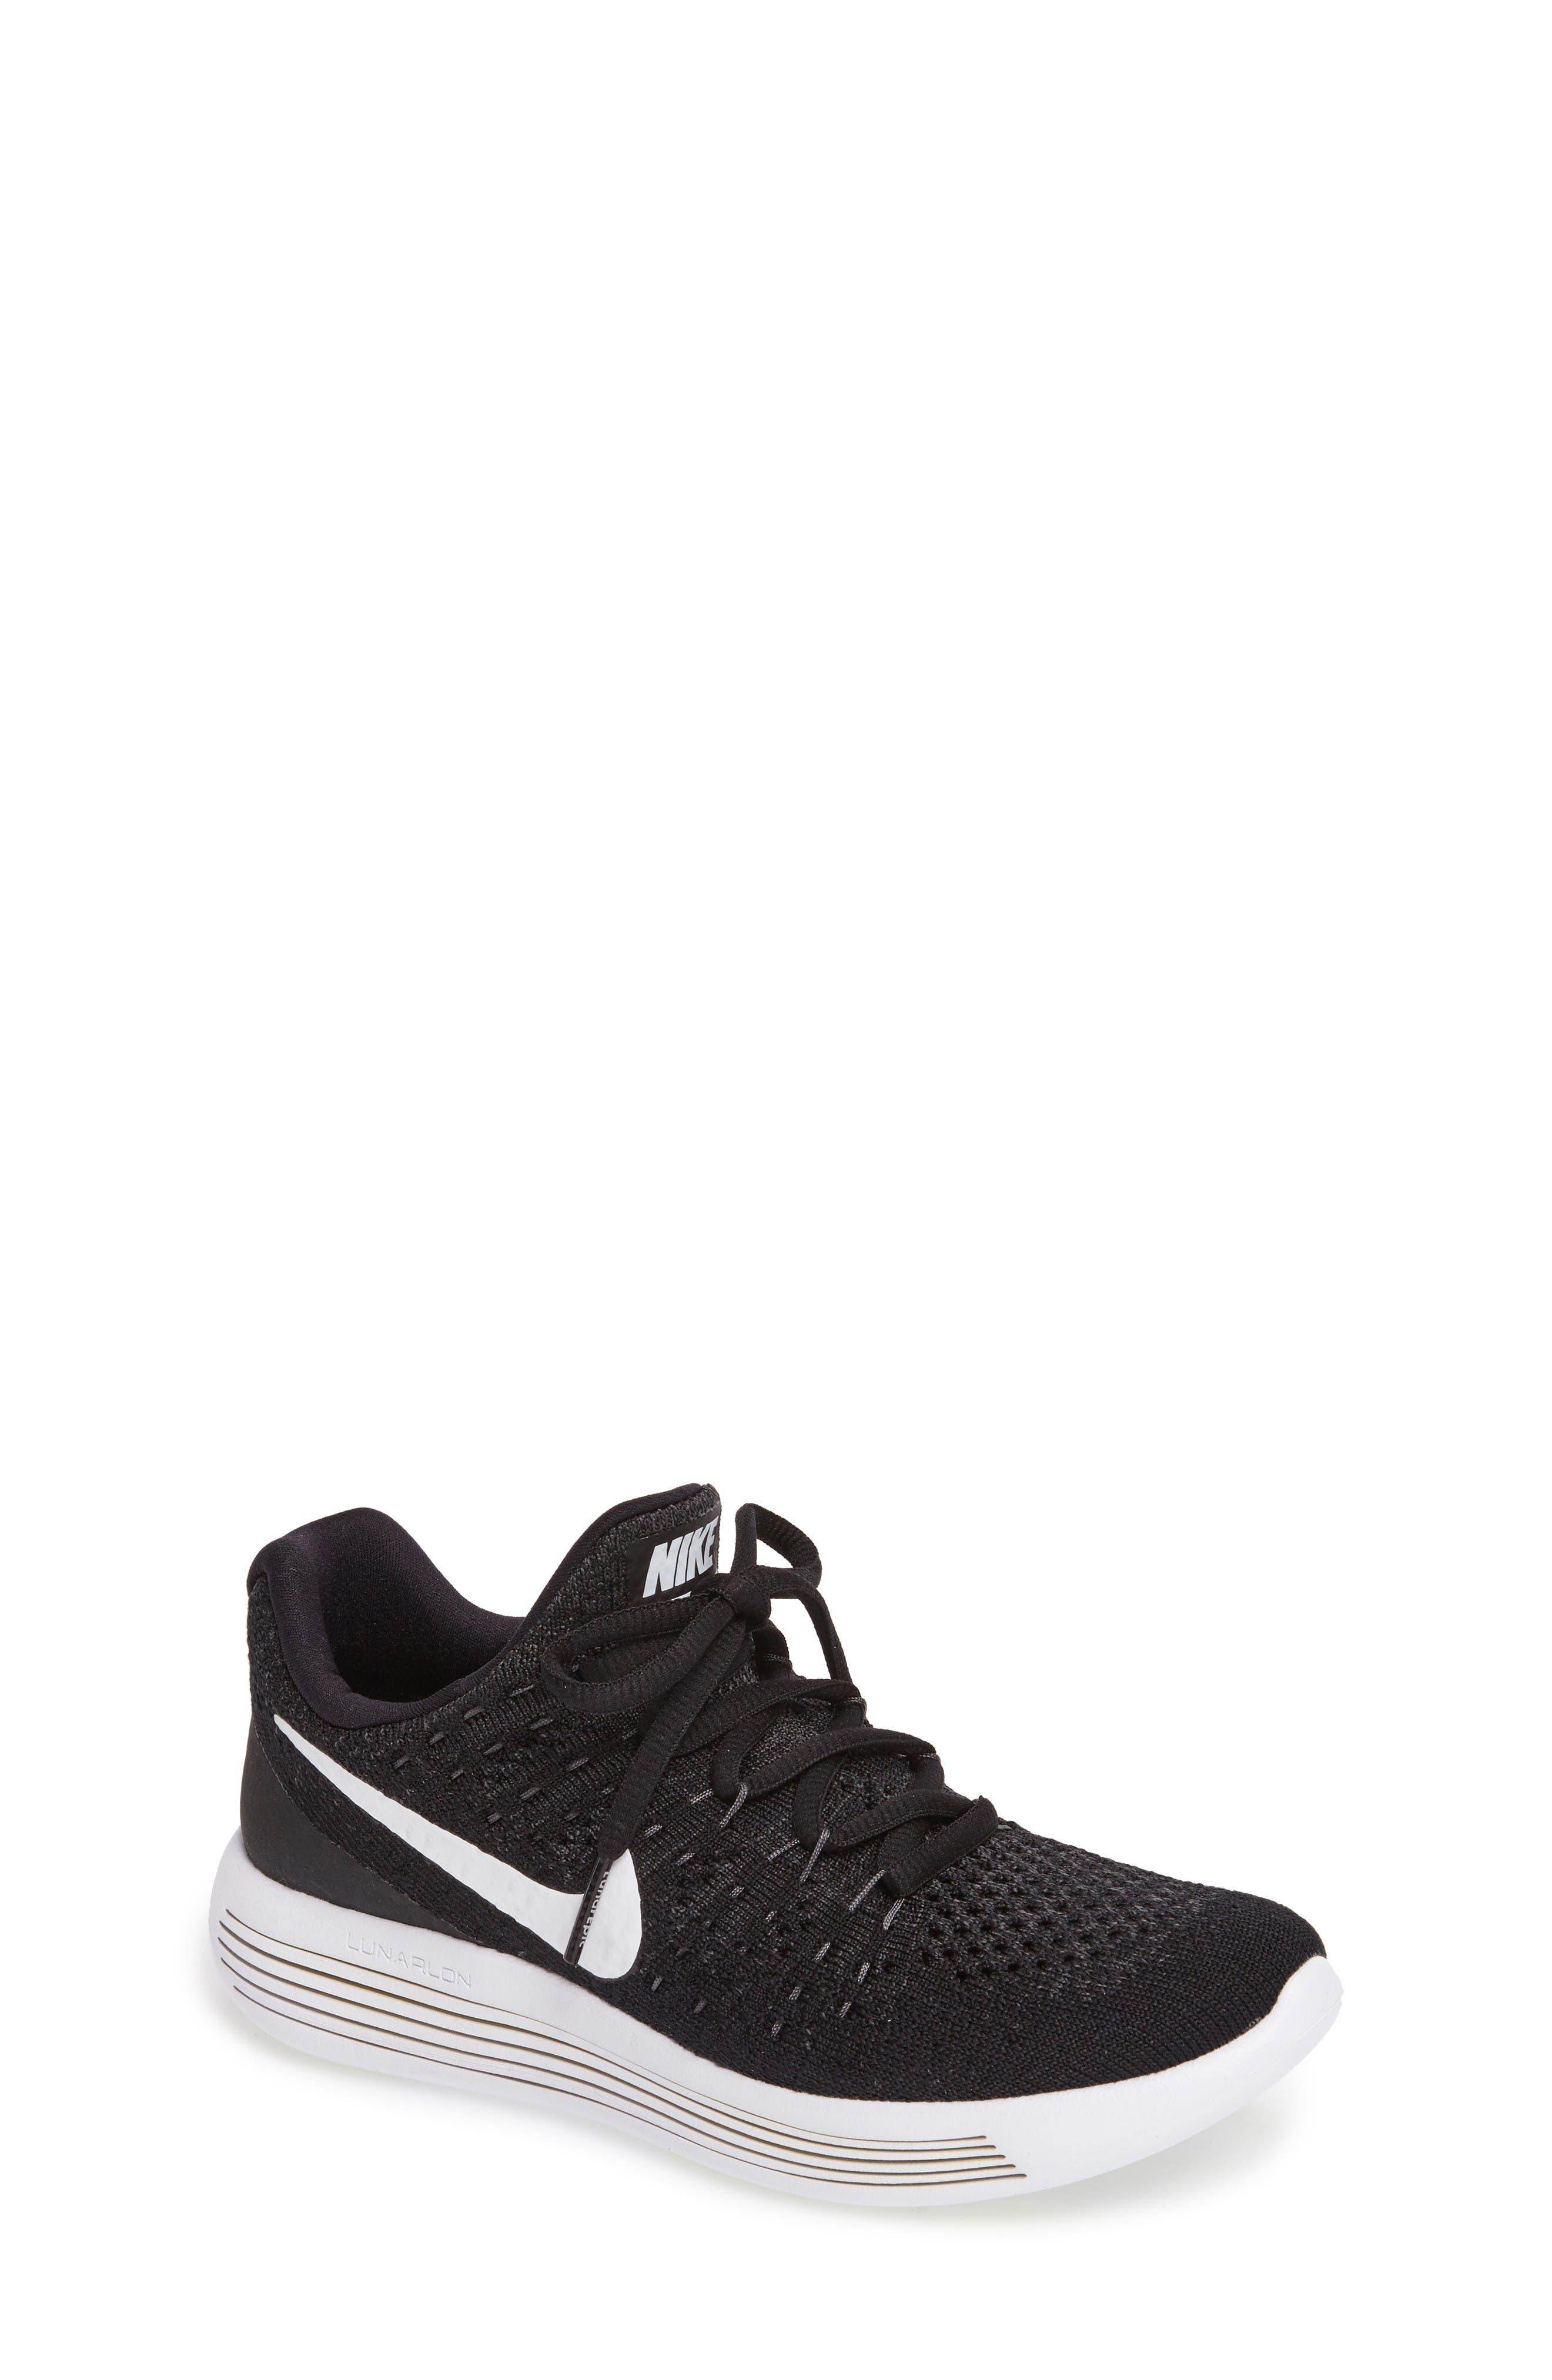 Alternate Image 1 Selected - Nike Flyknit LunarEpic Sneaker (Big Kid) (Regular Retail Price: $115.00)